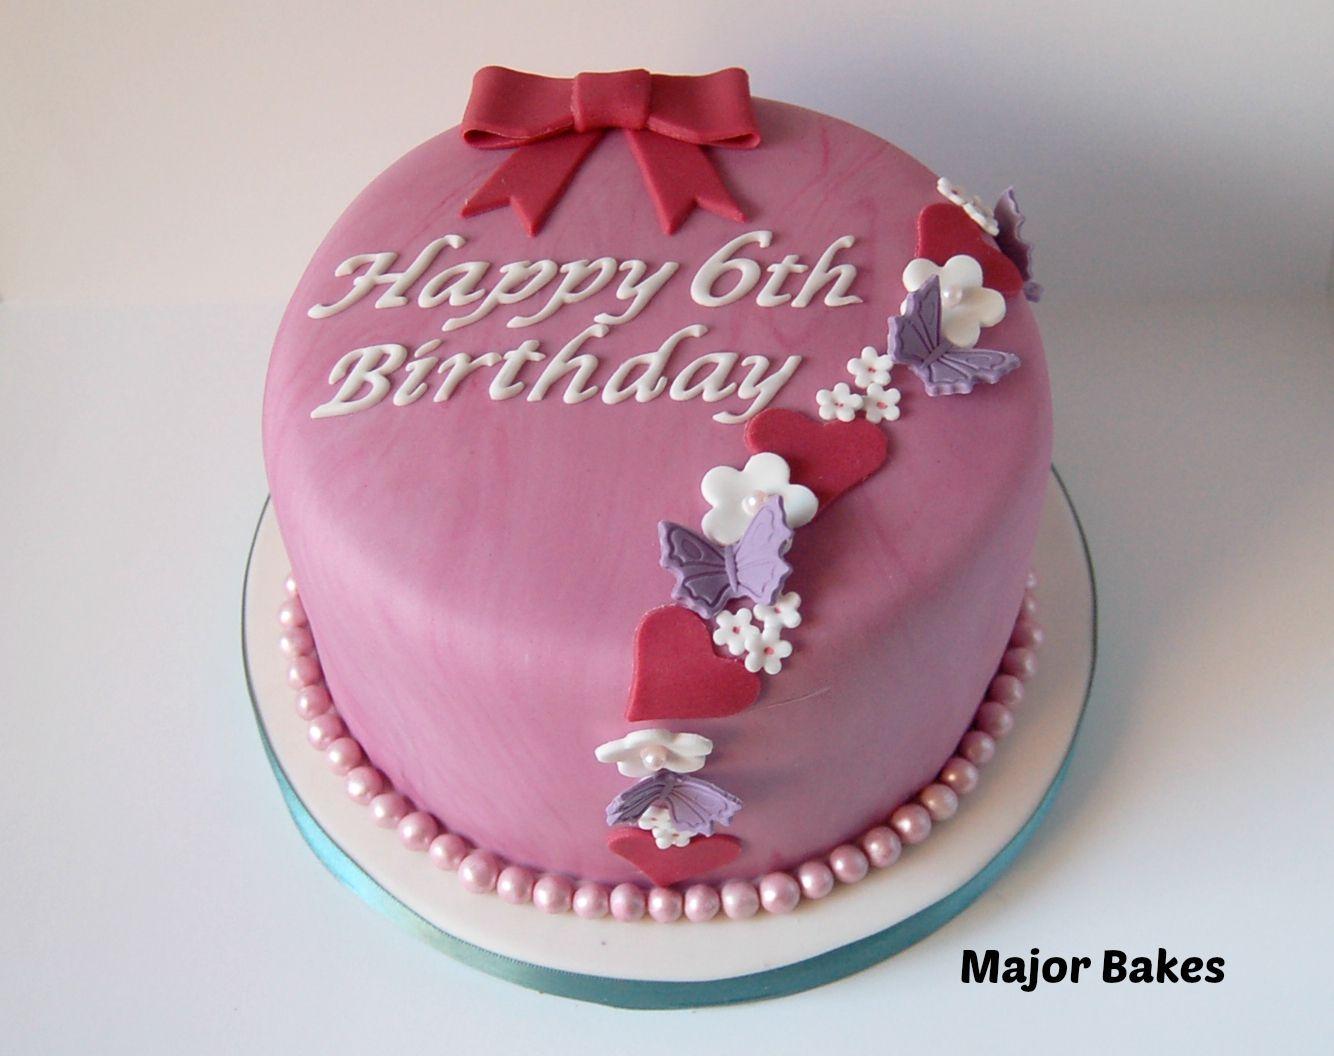 Girly birthday cake Celebration cakes by Major Bakes Pinterest